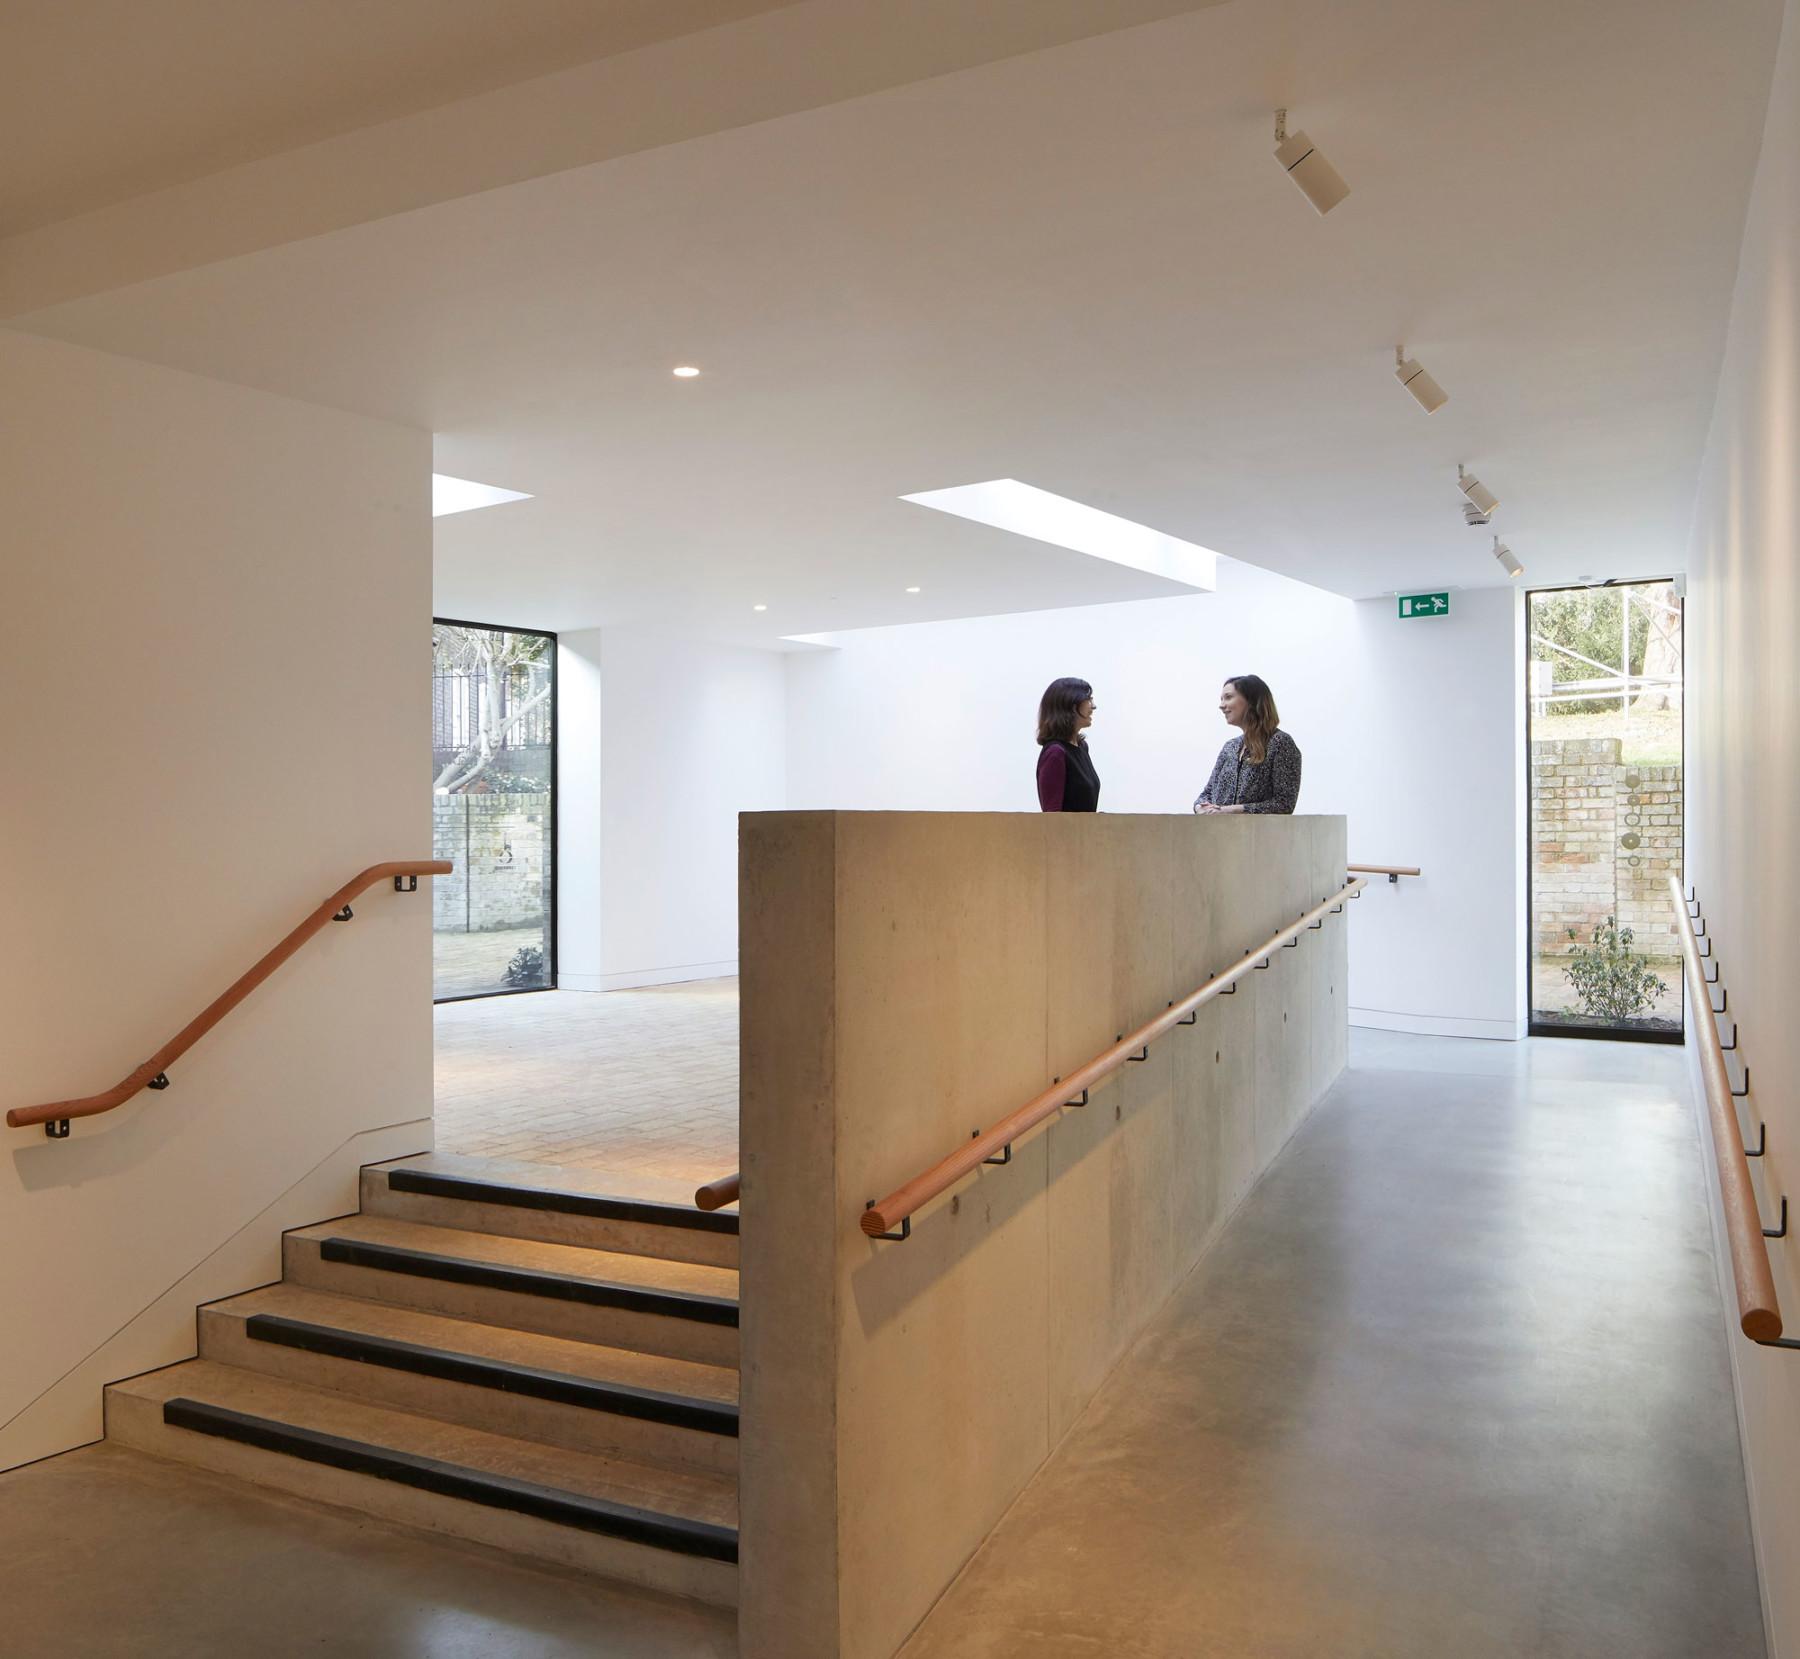 Jamie-Fobert-Architects Kettle's-Yard Cambridge Hufton+Crow 010